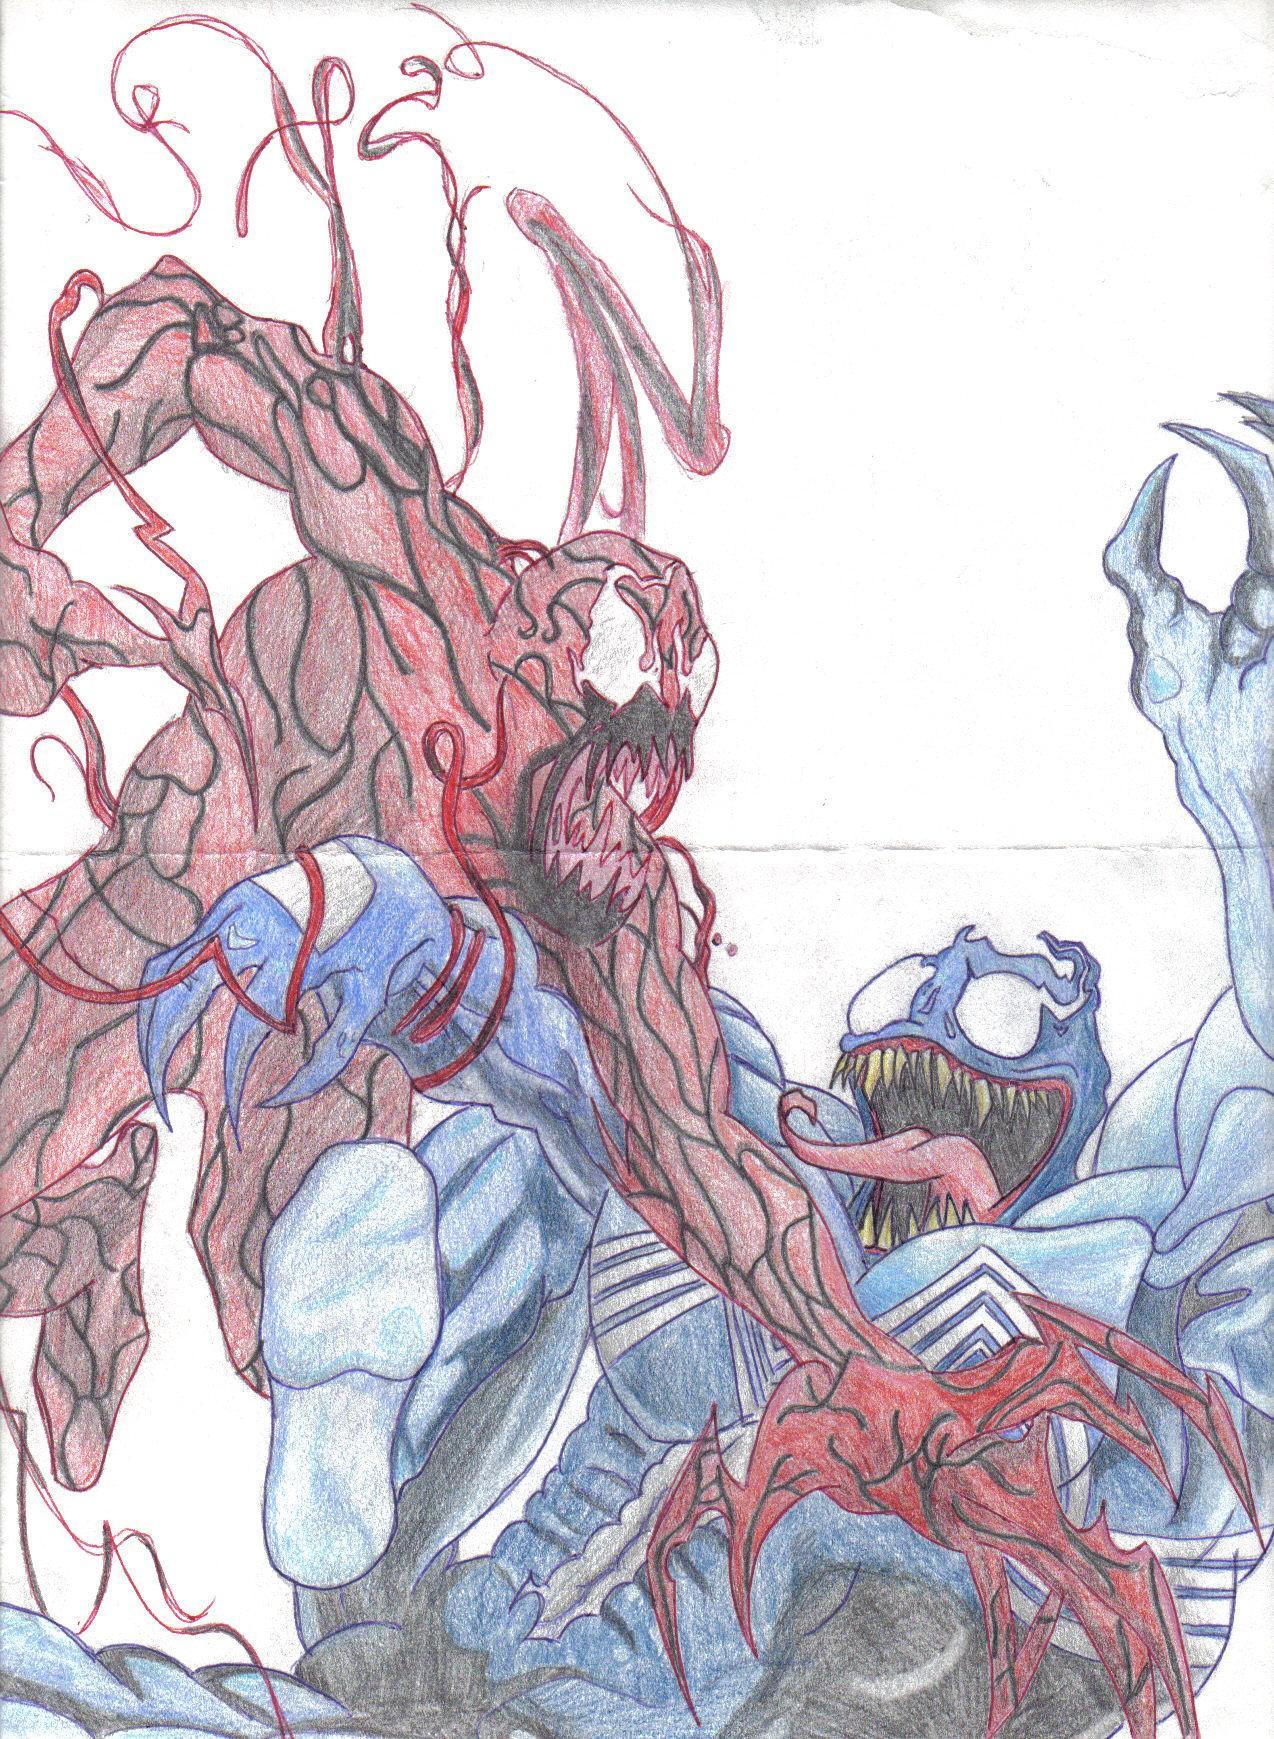 Venom vs Carnage by smeajul on DeviantArt